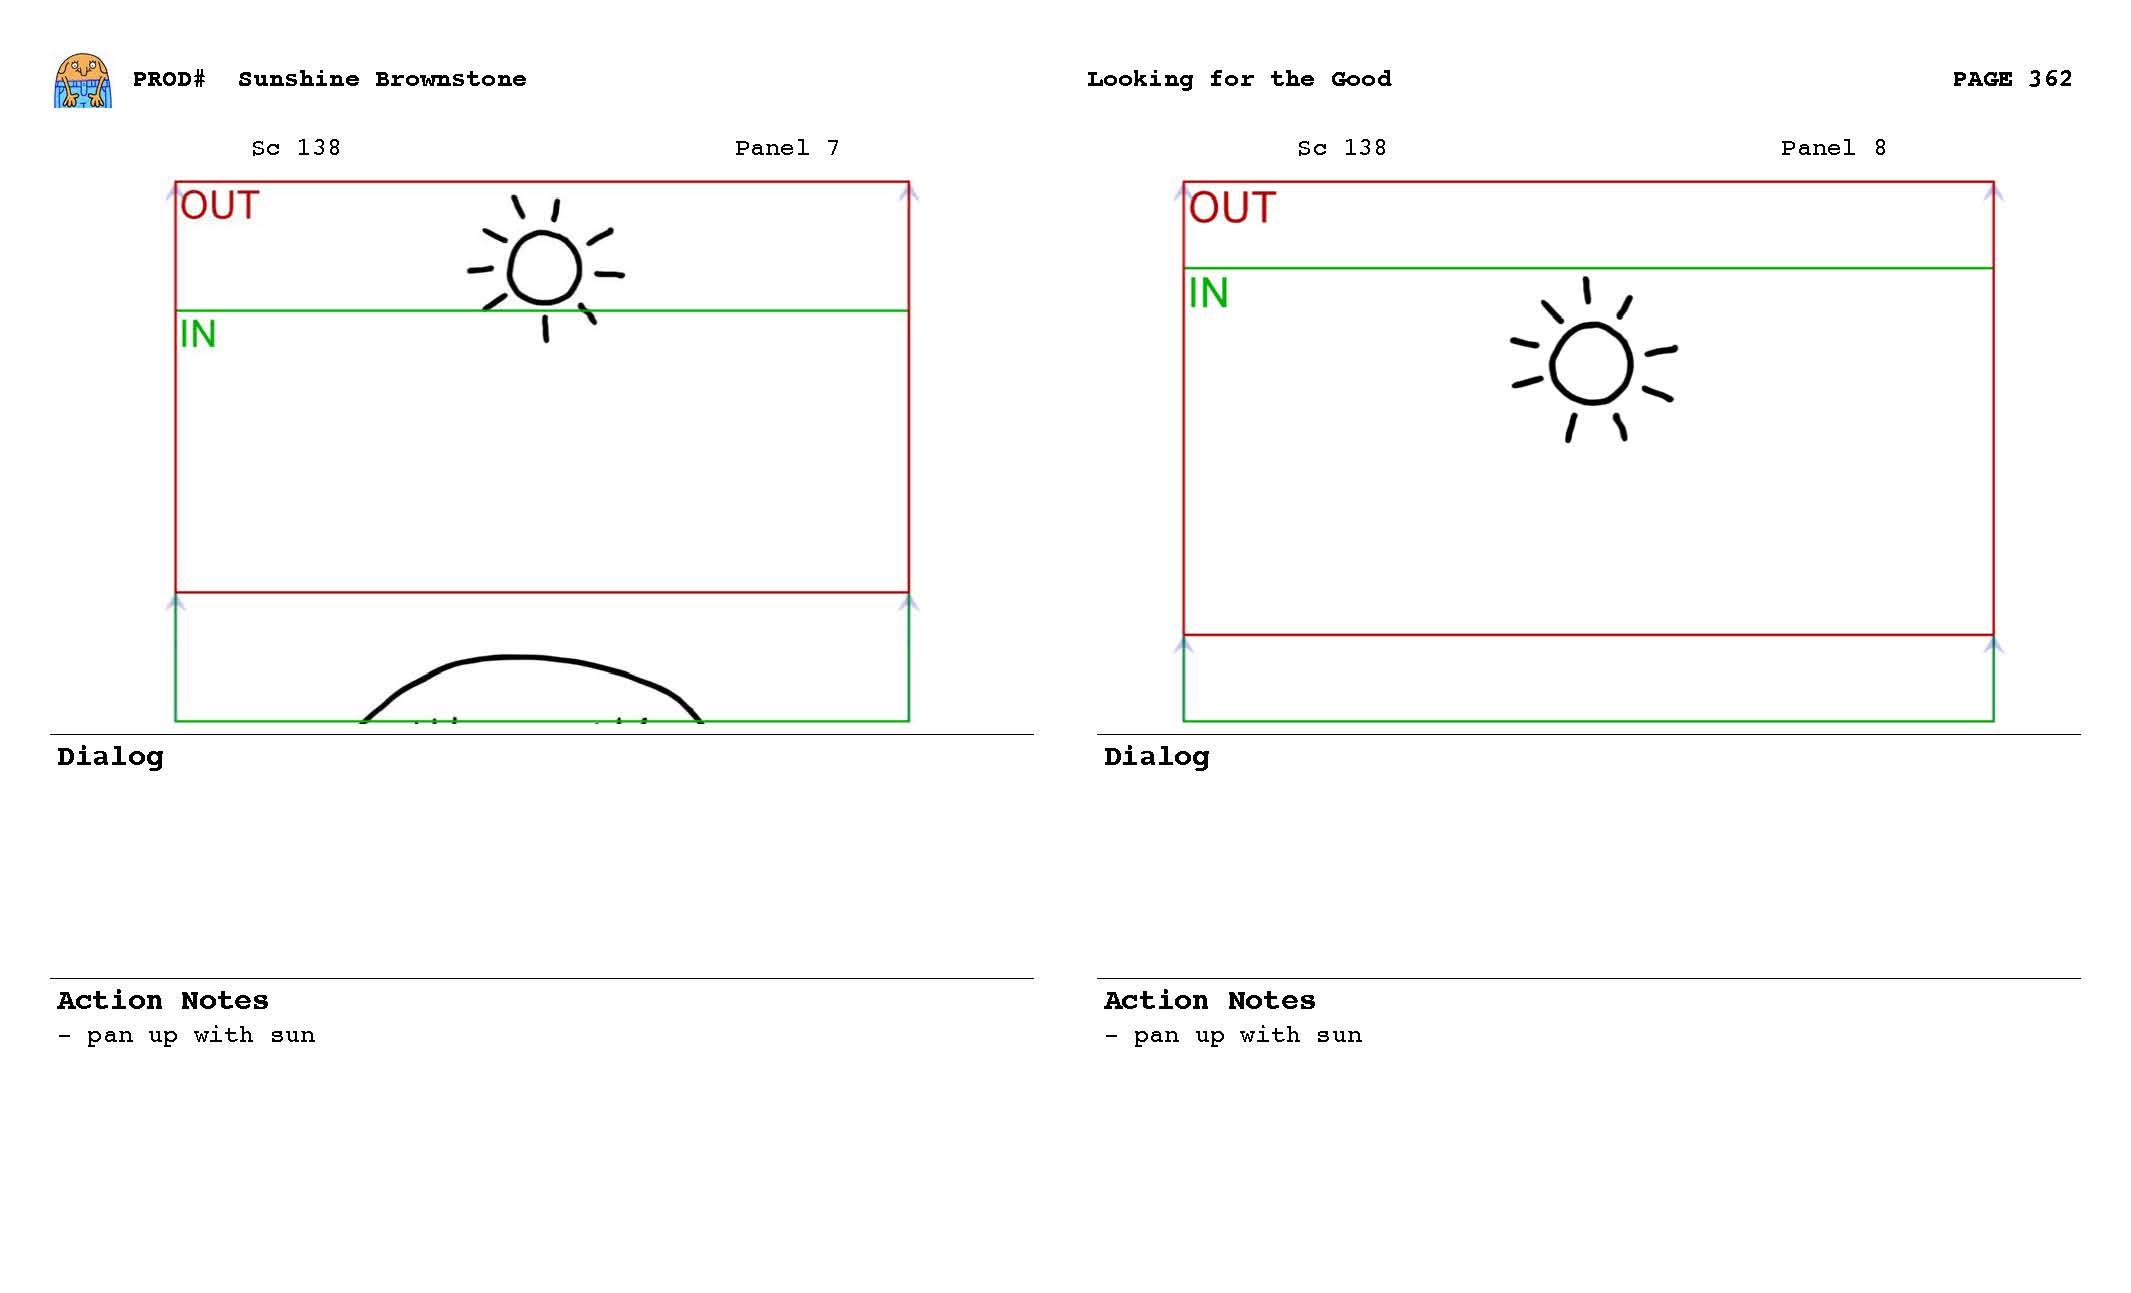 SunshineBrownstone_Dev1_Page_362.jpg